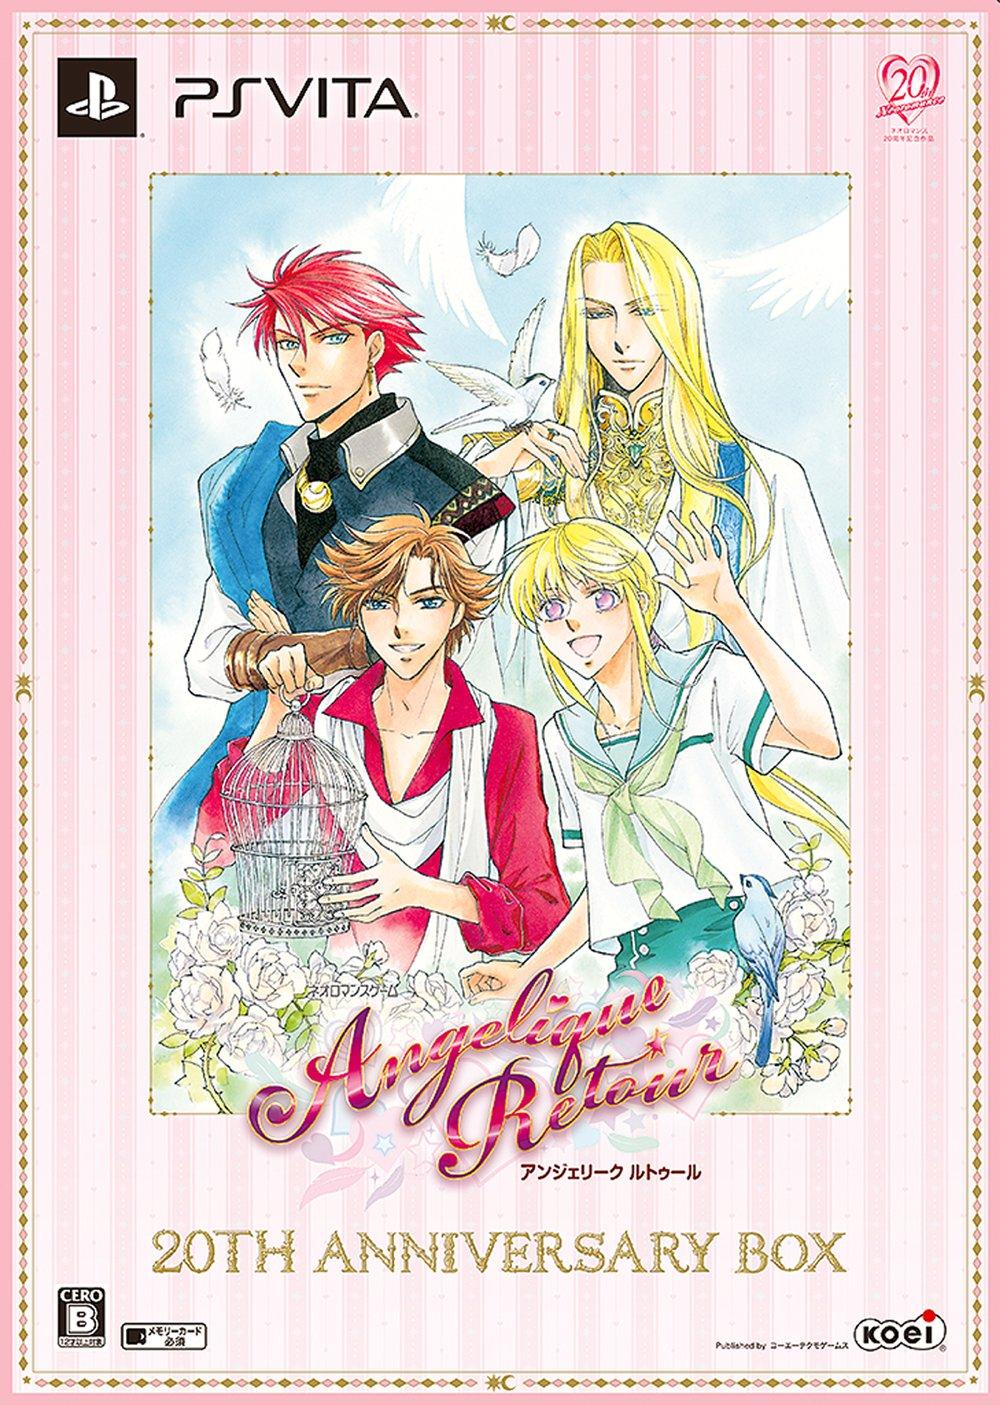 【Amazon.co.jp & GAMECITY限定】アンジェリーク ルトゥール セット - PS Vita B010NGZL40 GAMECITY限定